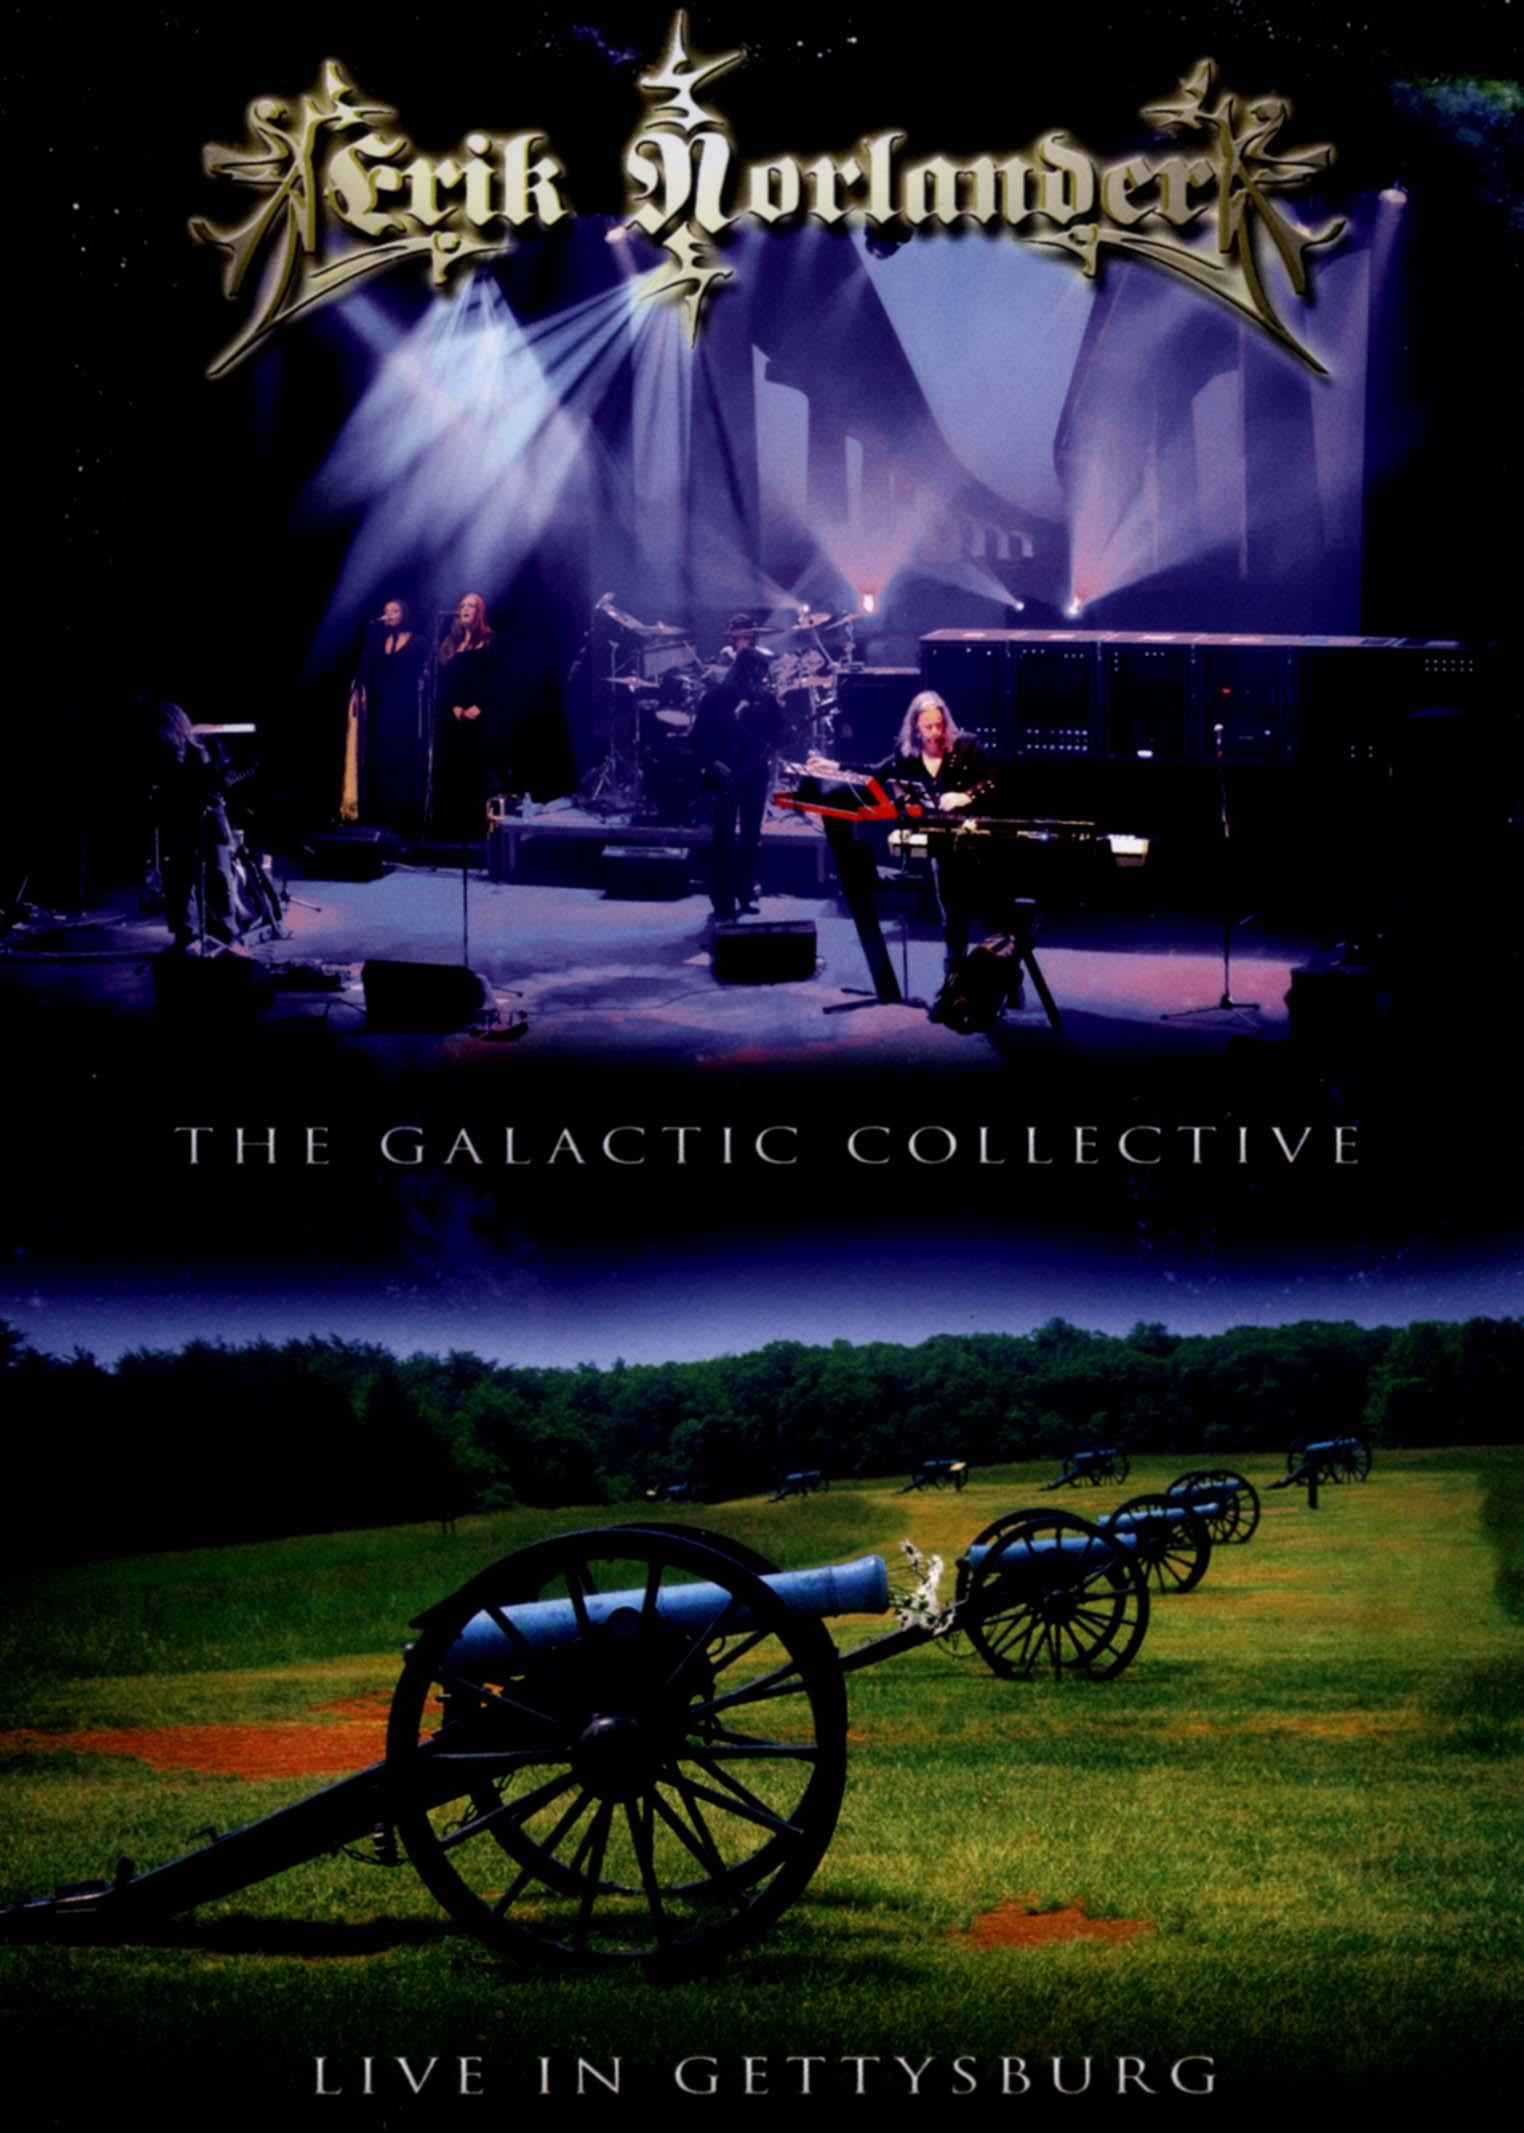 Erik Norlander: The Galactic Collective - Live in Gettysburg